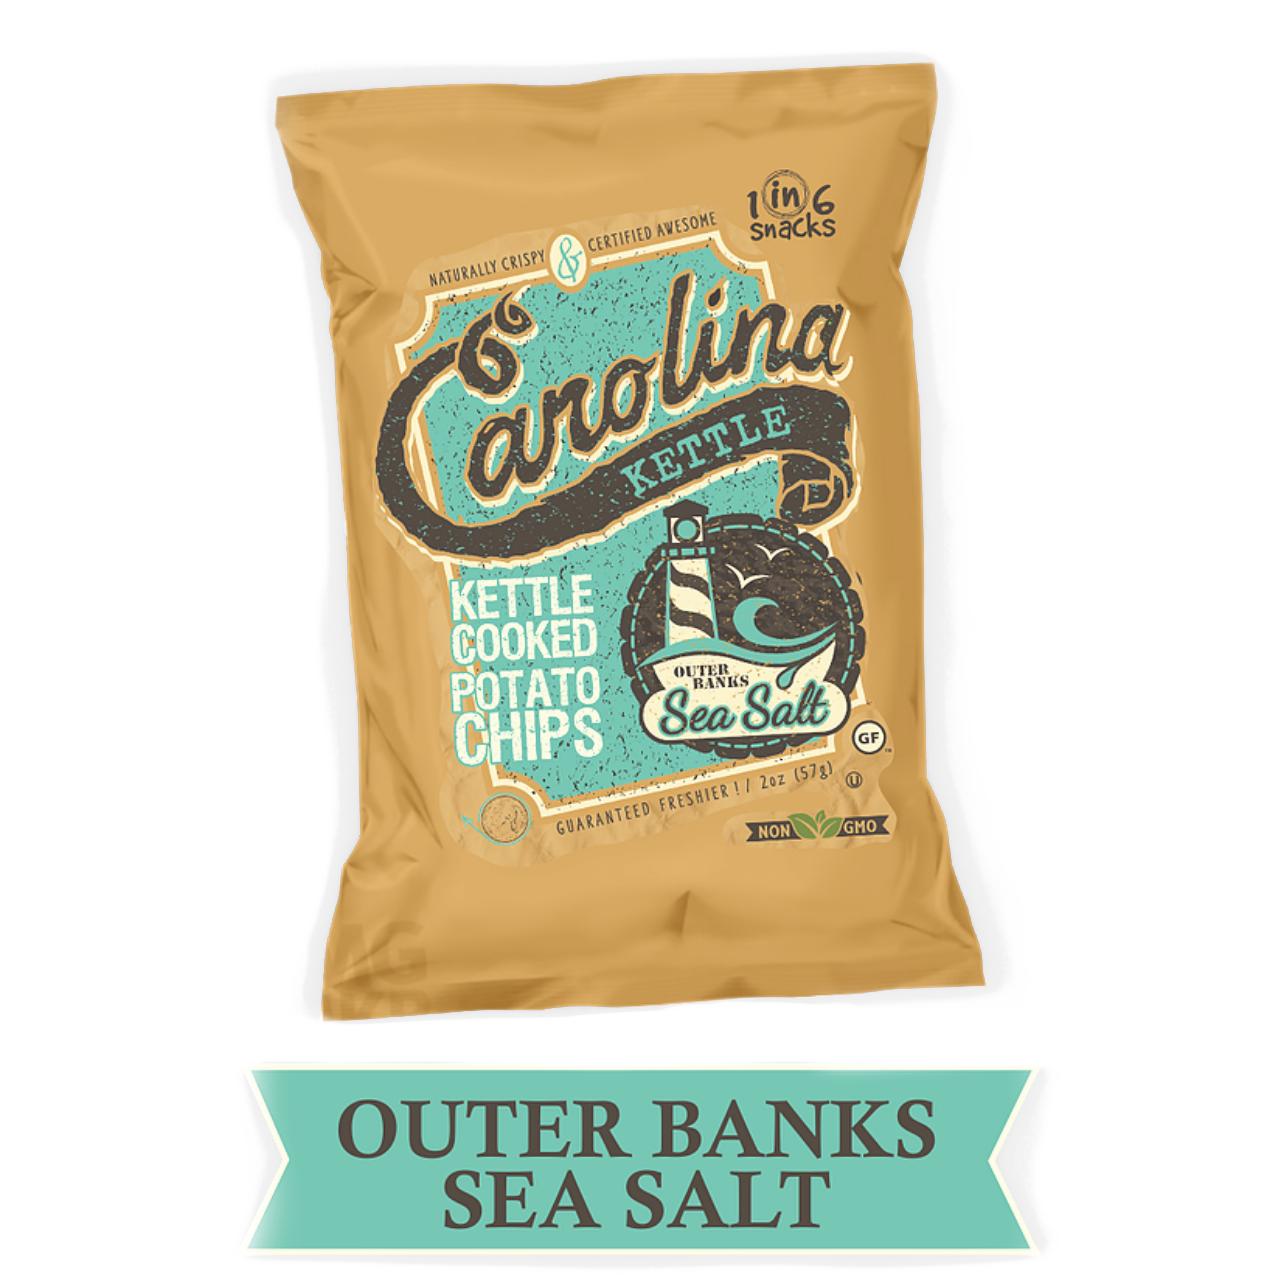 1 in 6 Snacks Outer Banks Sea Salt Potato Chips, 2oz